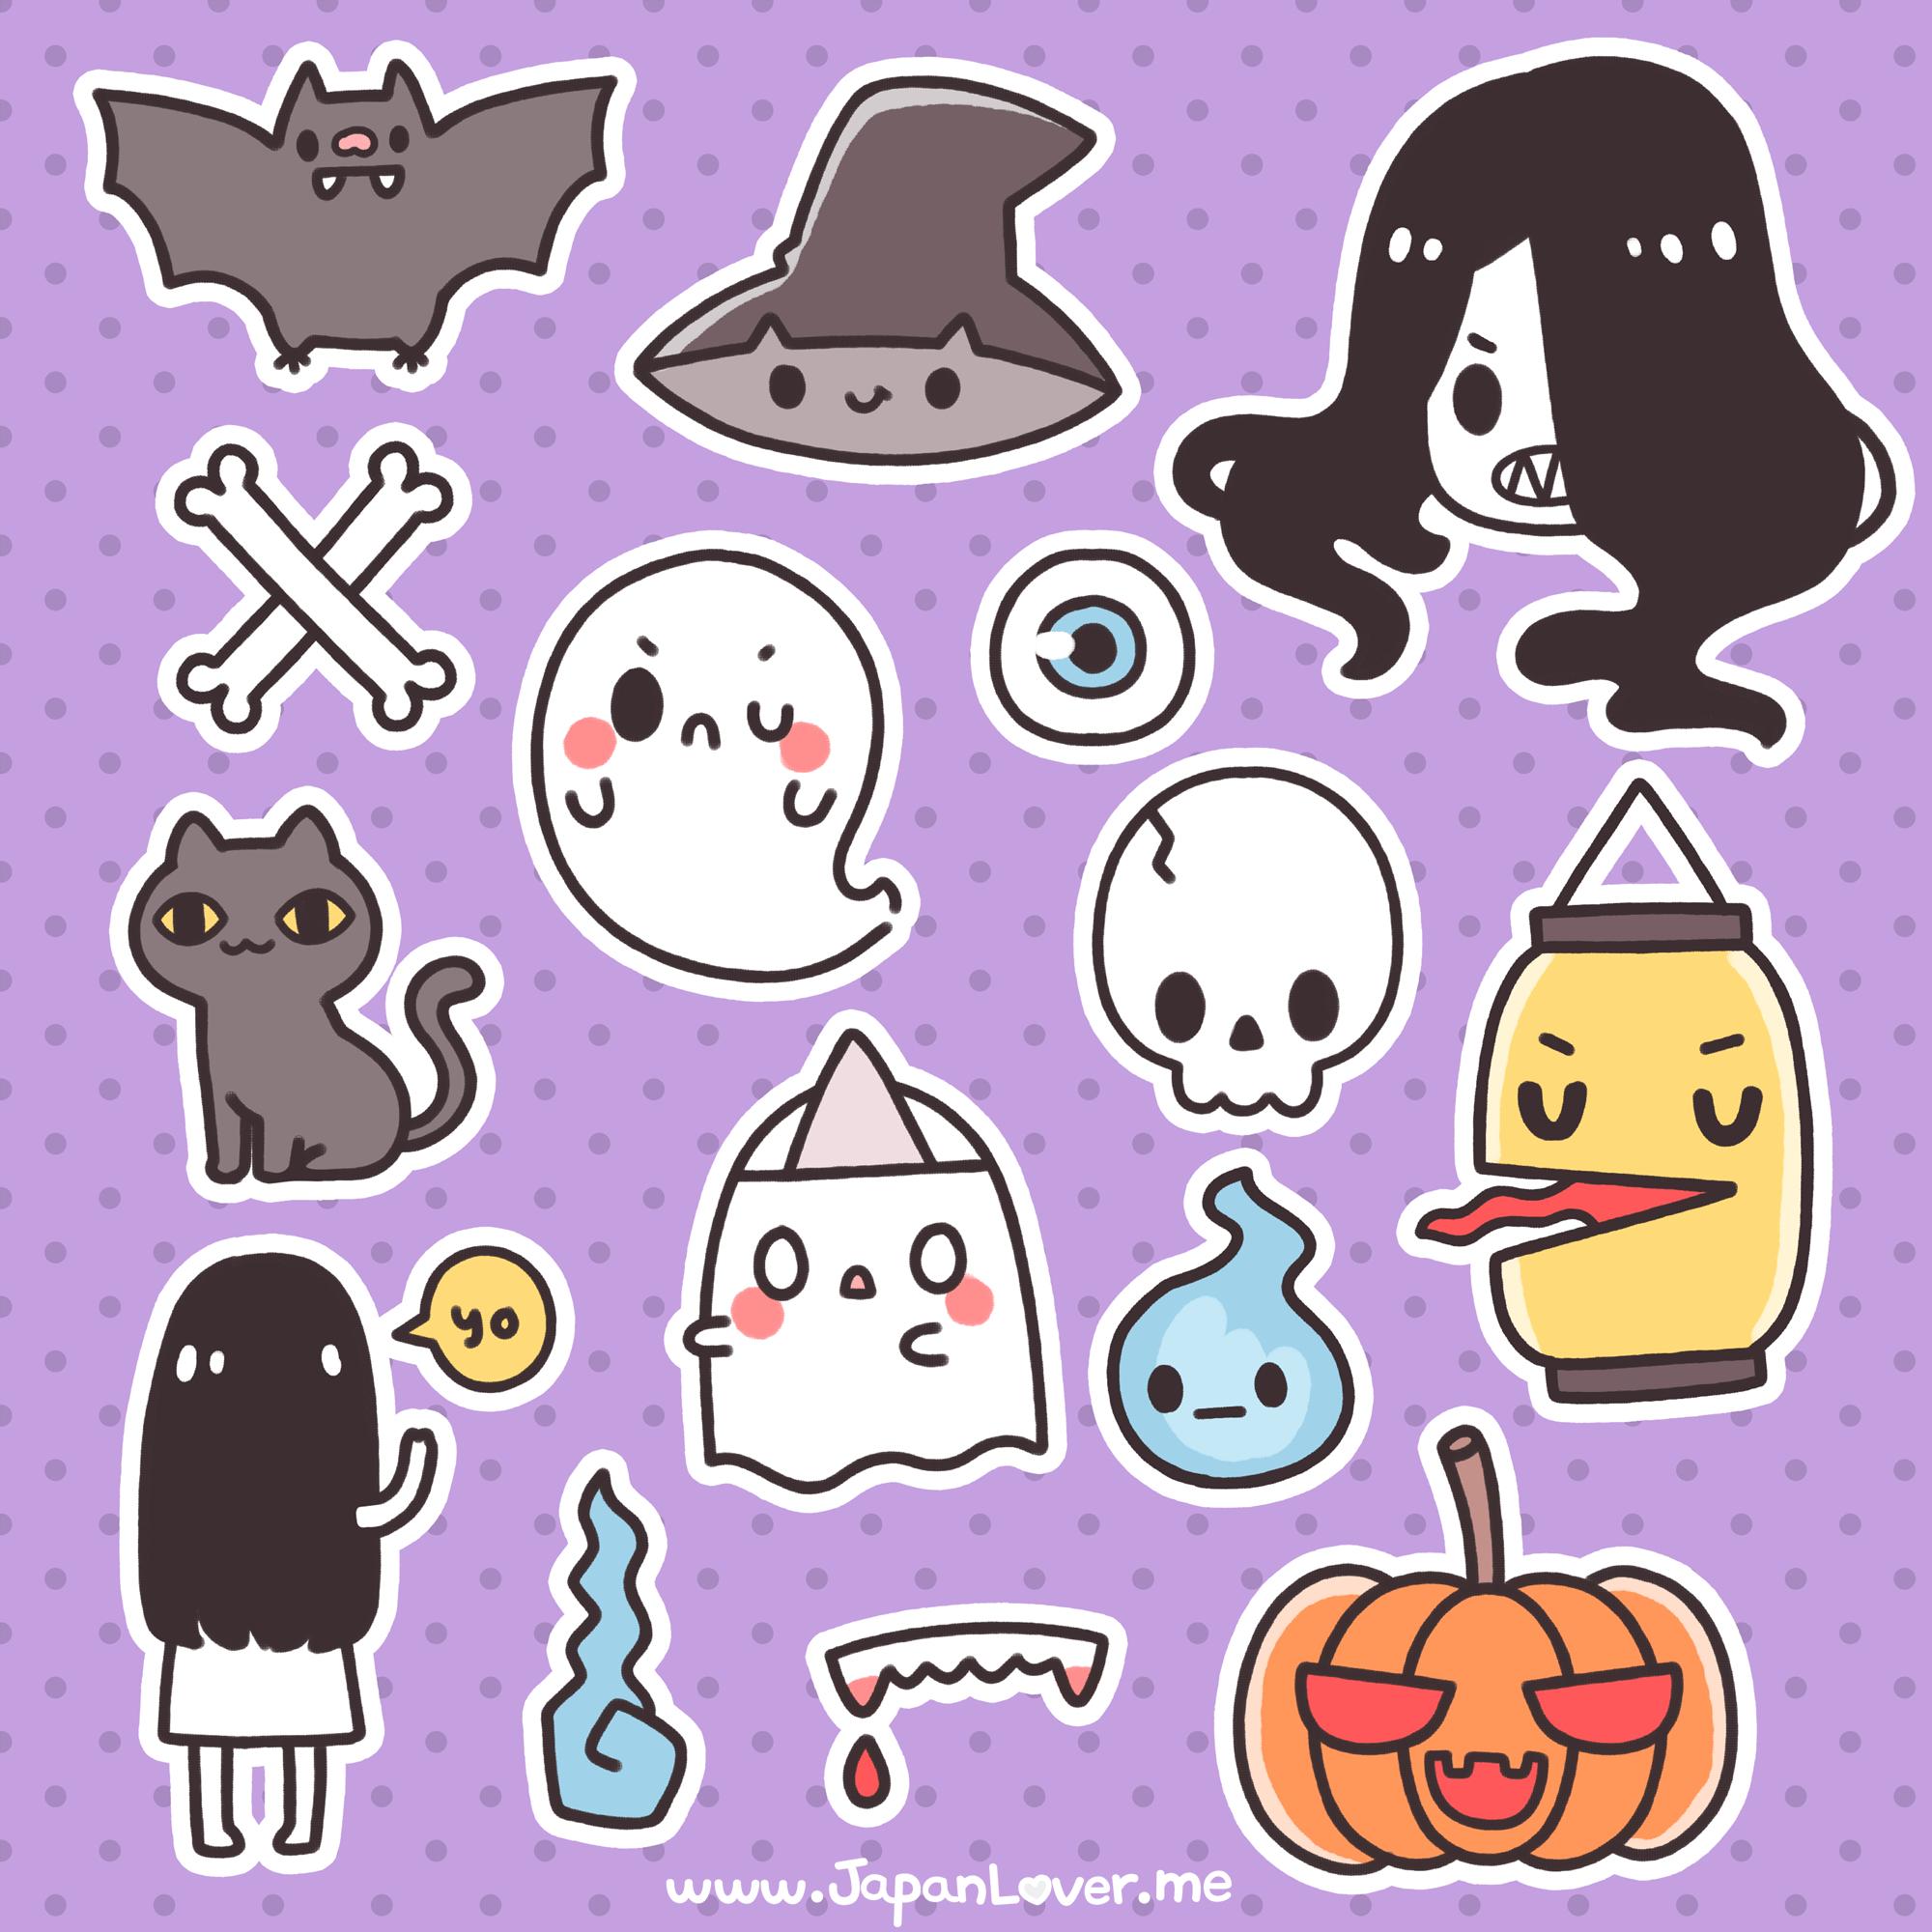 Printable Spooky Kawaii Stickers For Halloween! | Kawaii Japan Lover Me - Free Printable Kawaii Stickers